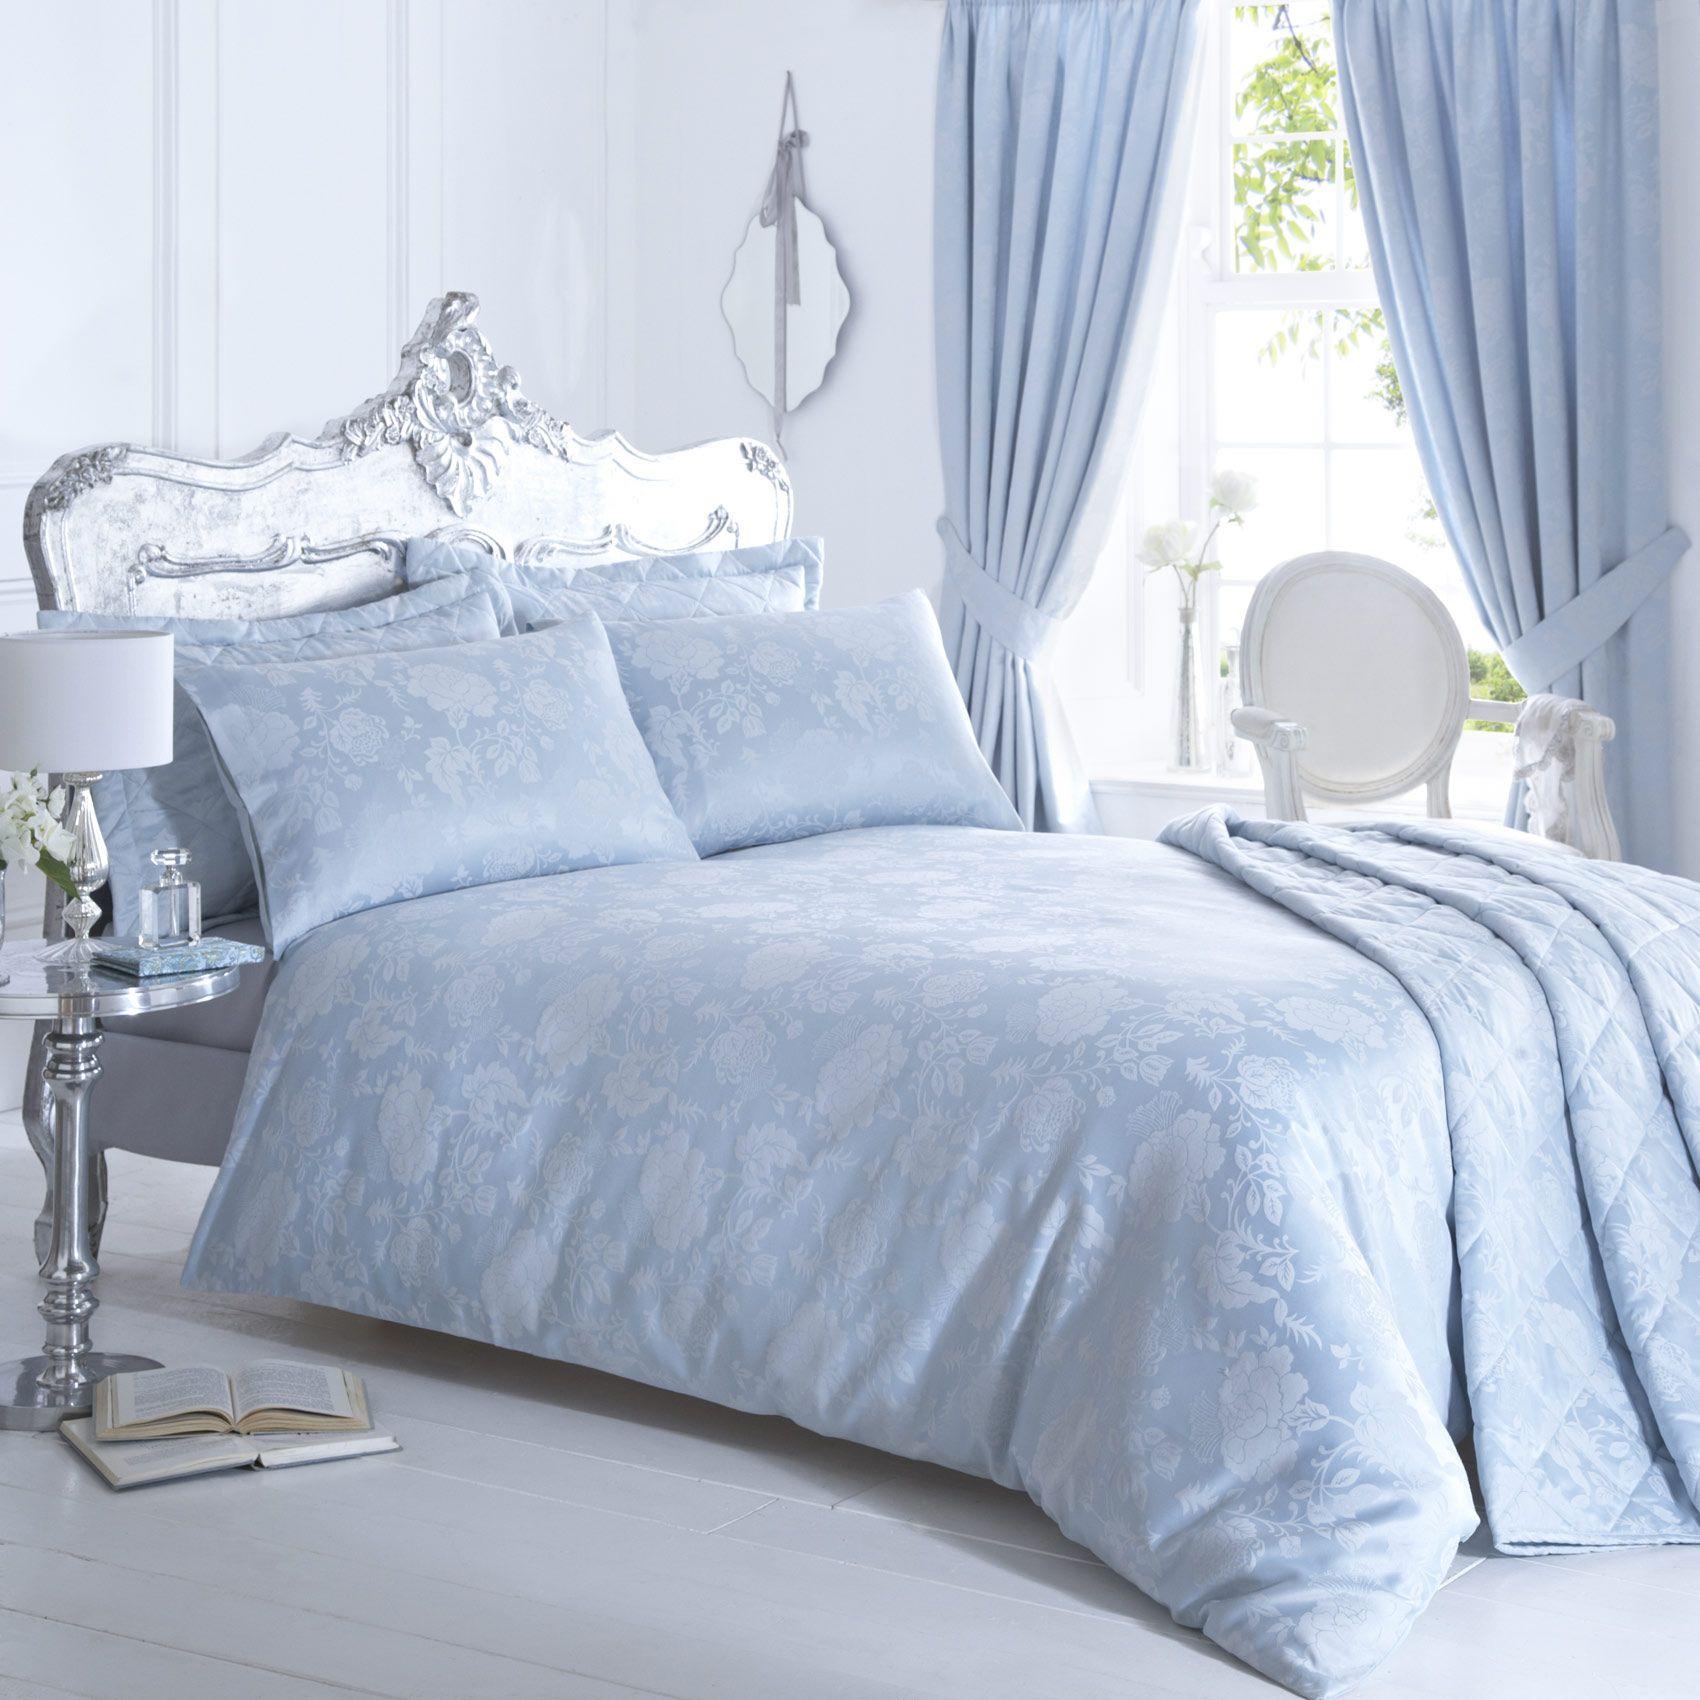 Vantona Rose Damask Jacquard Duvet Cover Sets - Duck Egg / Blue ... : duck egg blue quilt cover sets - Adamdwight.com